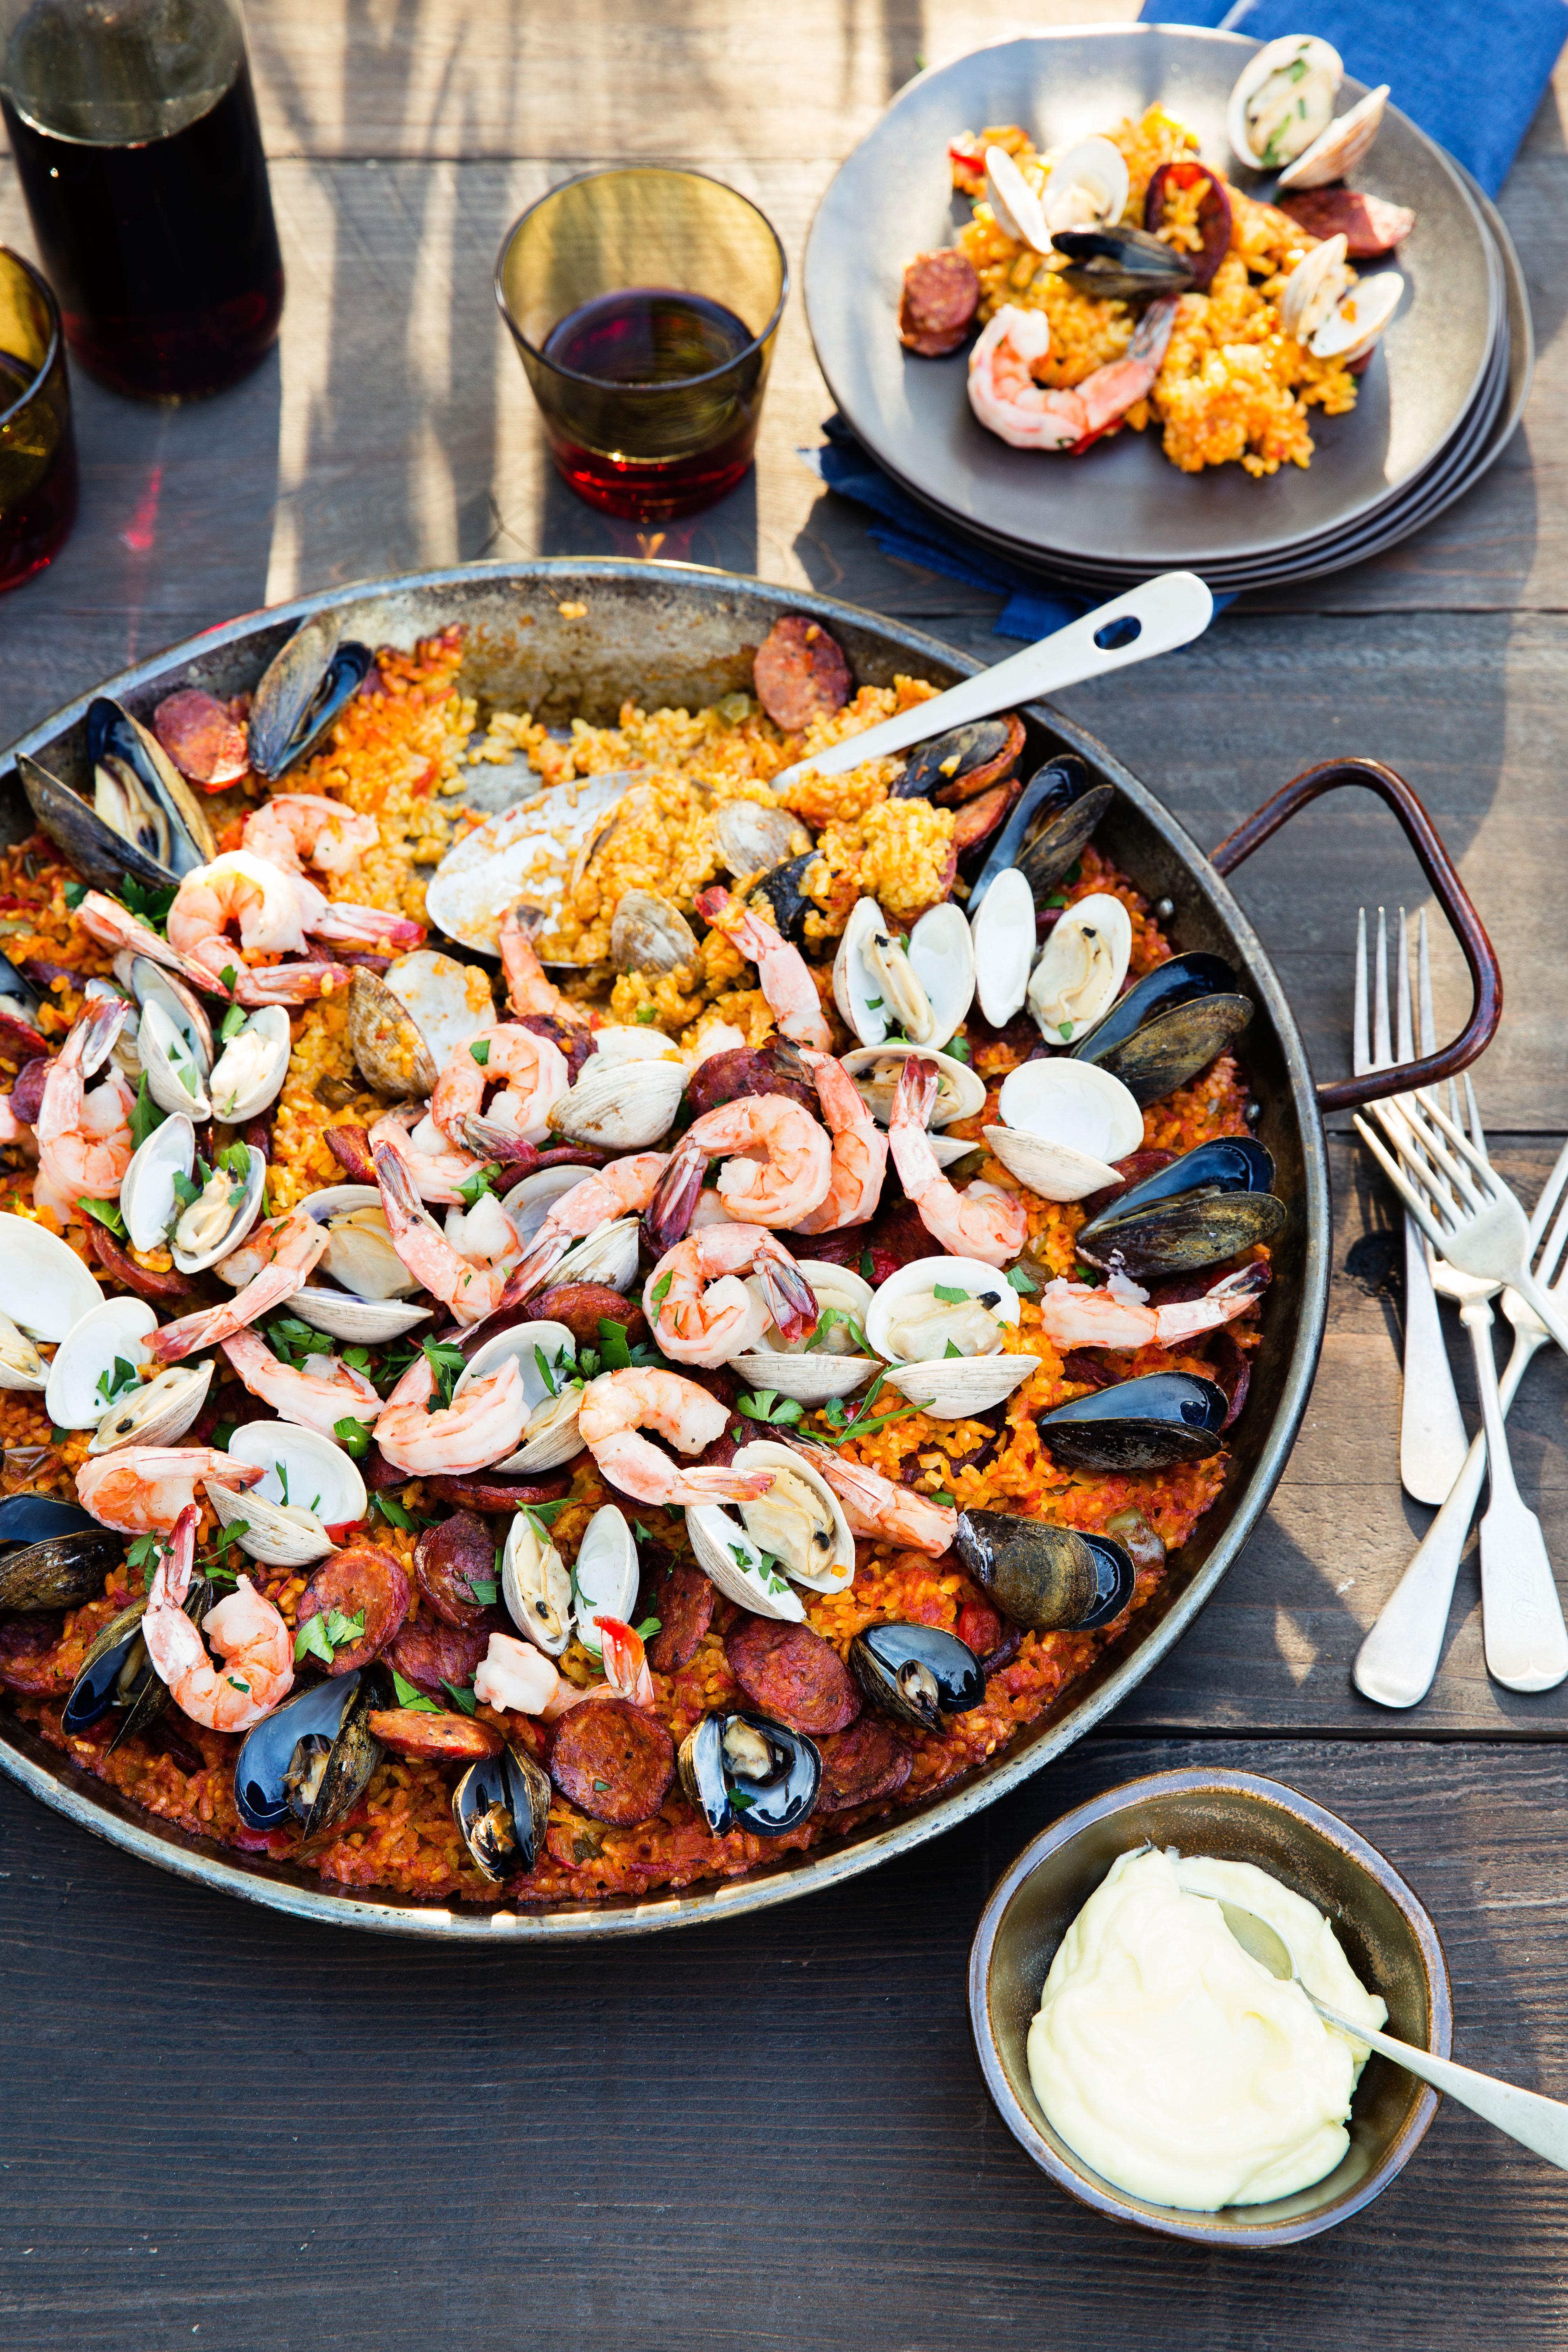 Grilled Seafood and Chorizo Paella with Saison